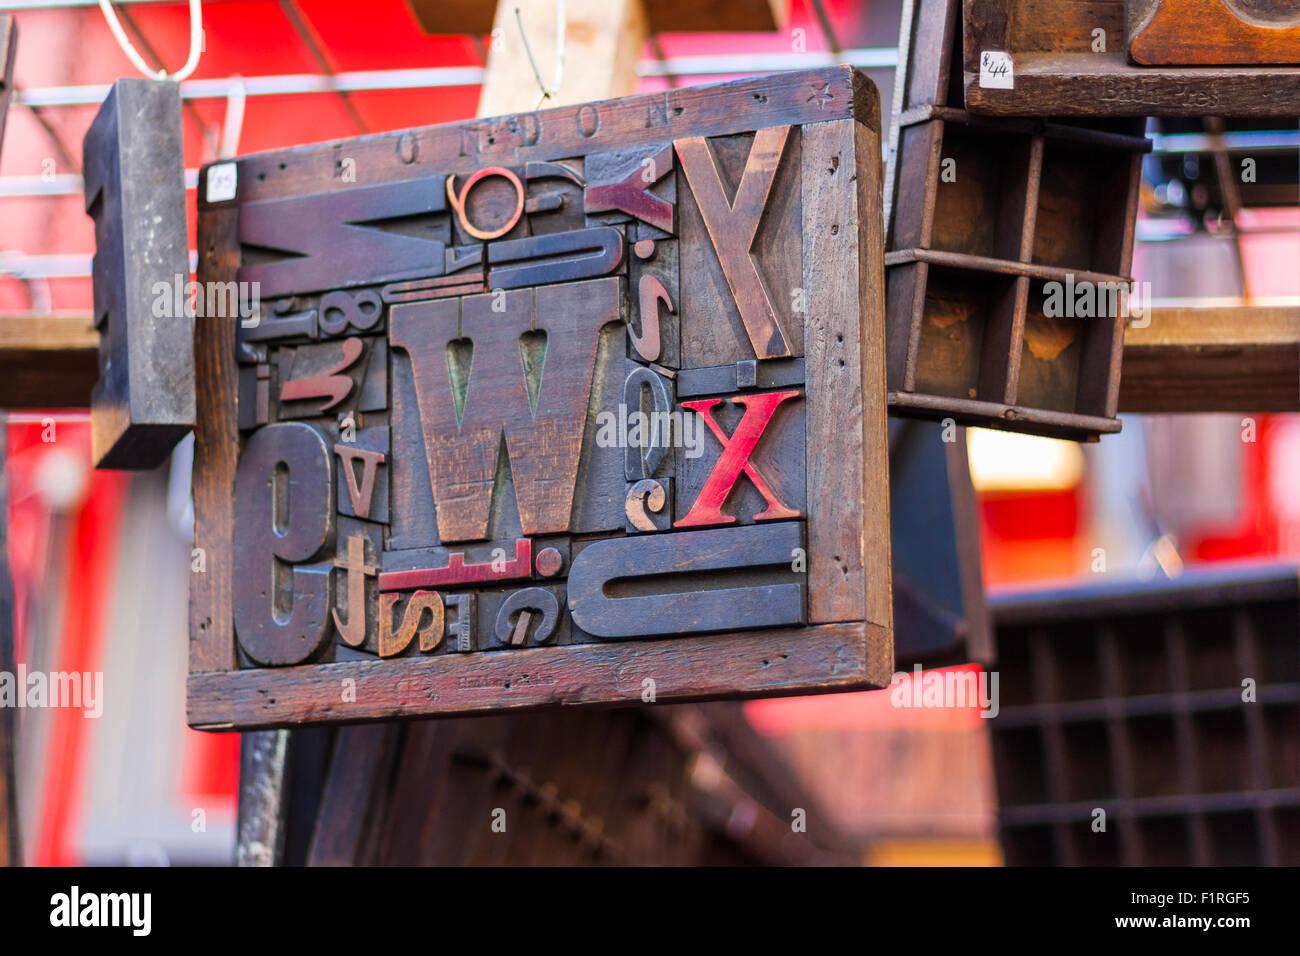 Wood block type in Portobello Road Market, Kensington and Chelsea, London, England, United Kingdom - Stock Image